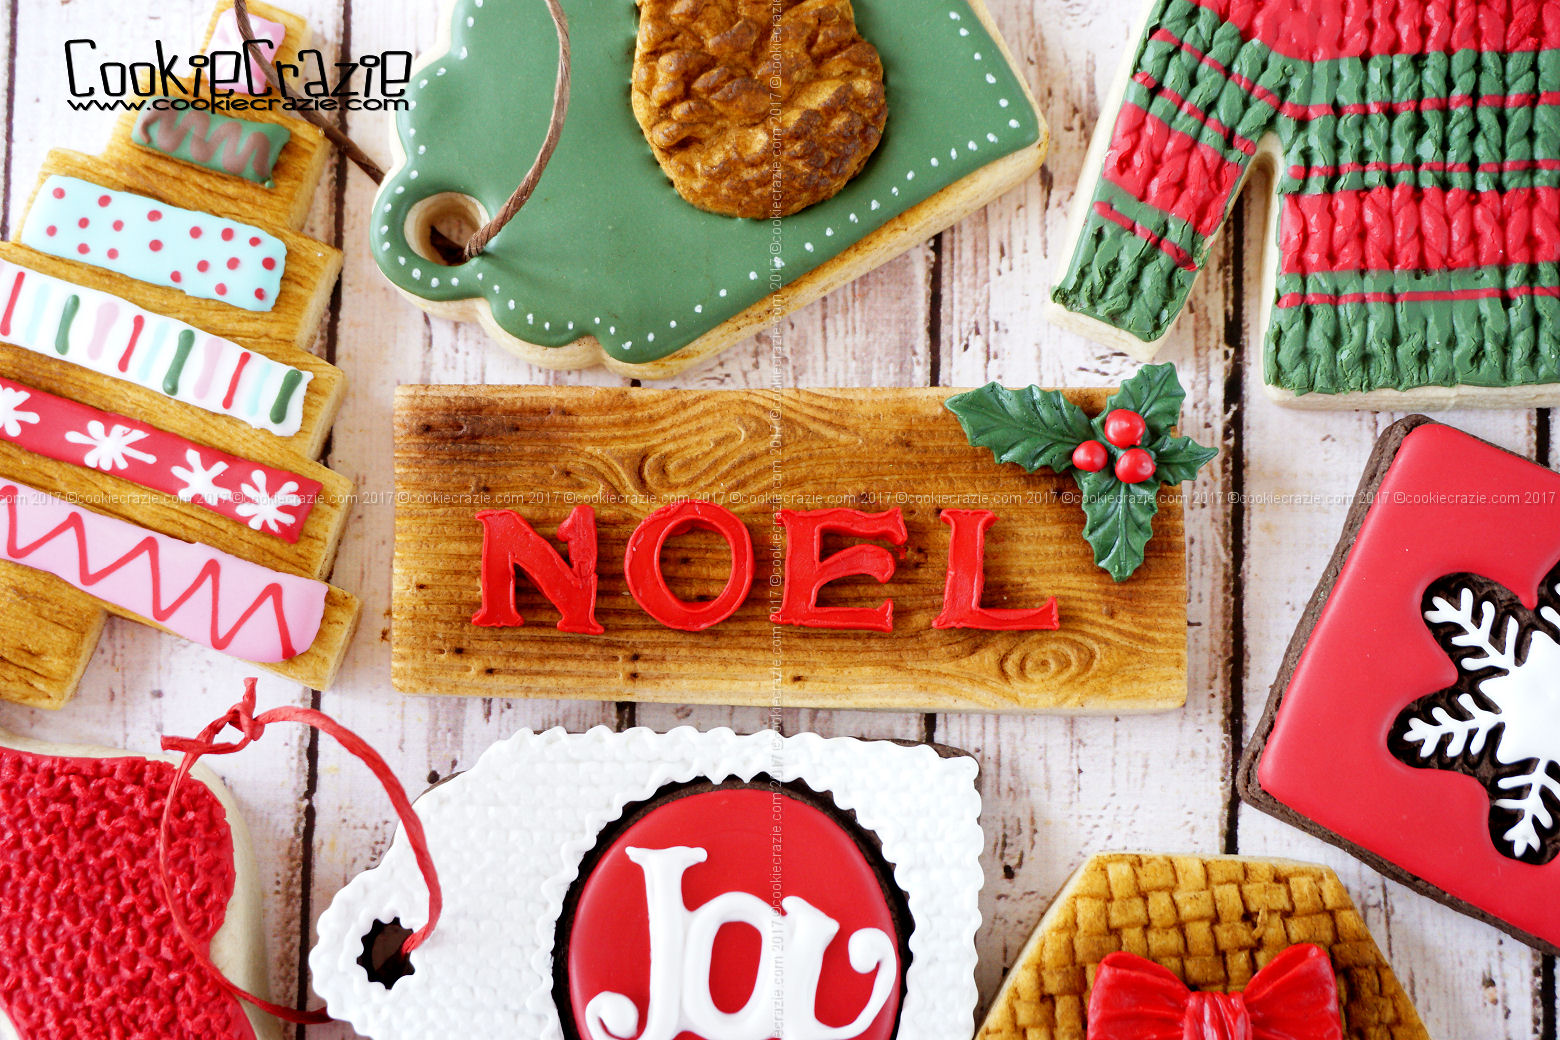 Wood Grain NOEL Plaque Decorated Sugar Cookie YouTube video  HERE